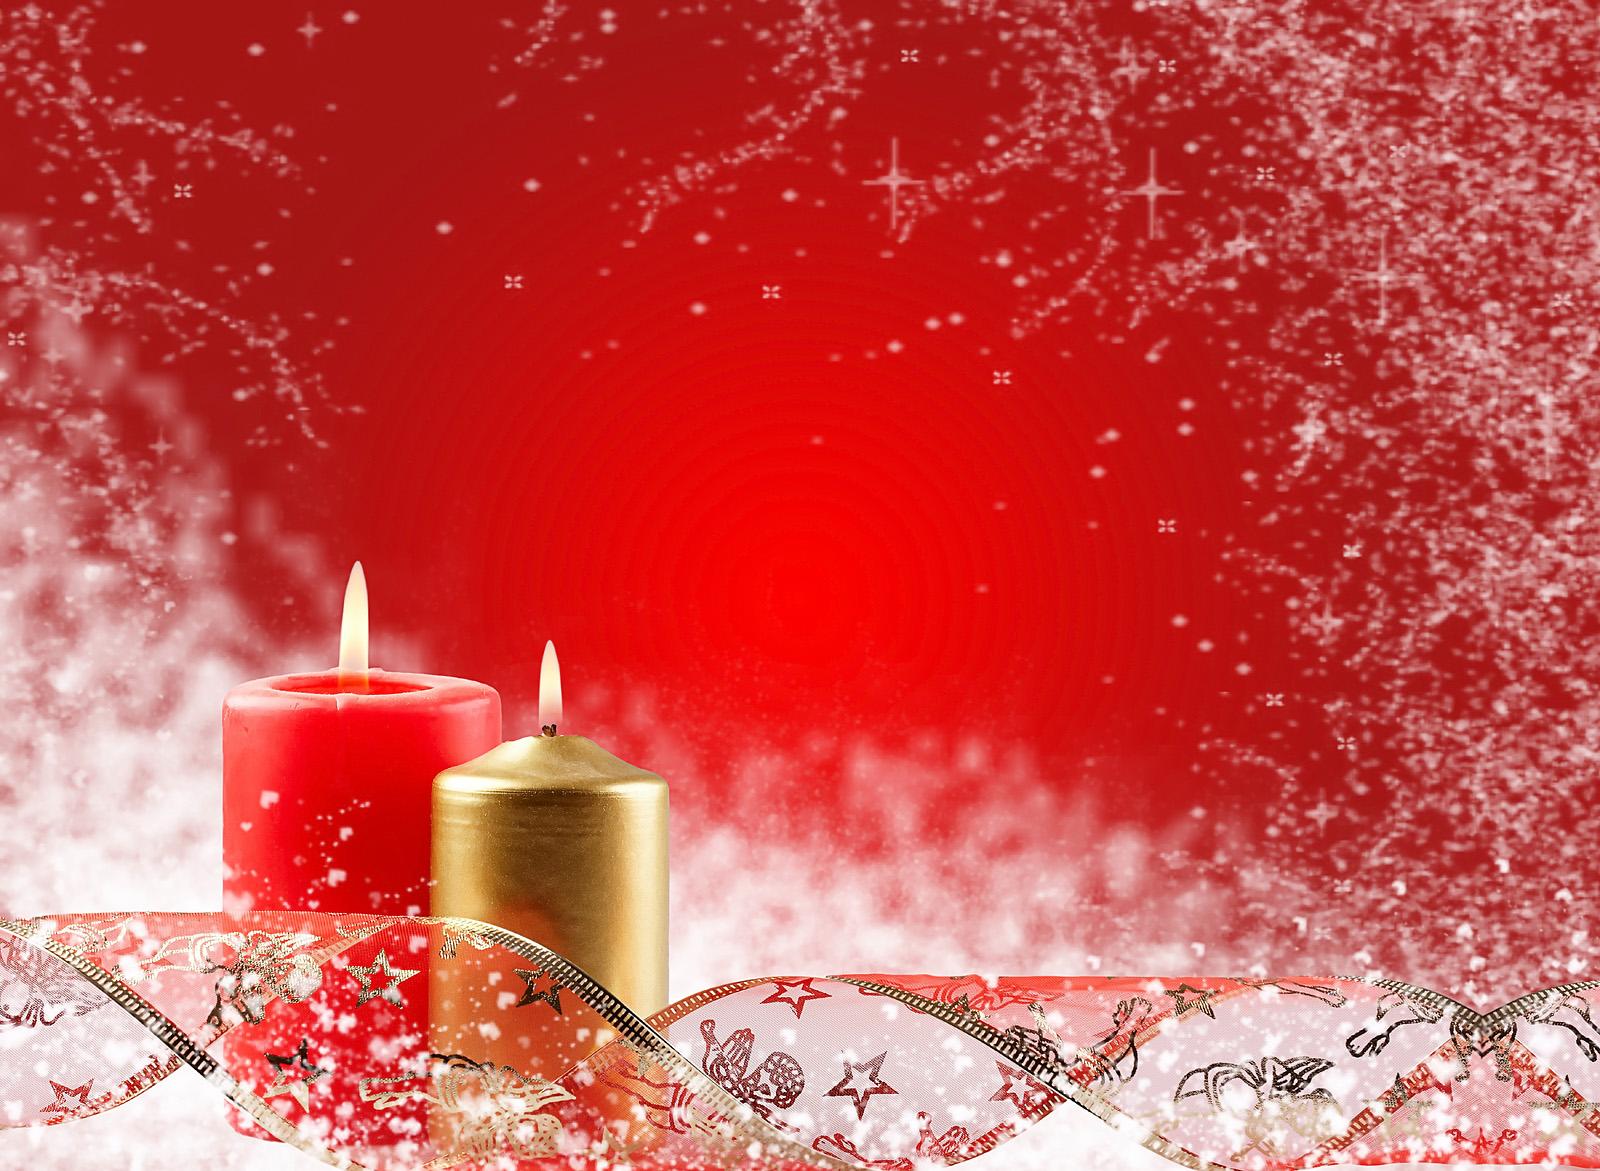 Free Christmas Wallpapers: Christmas Candles Wallpapers